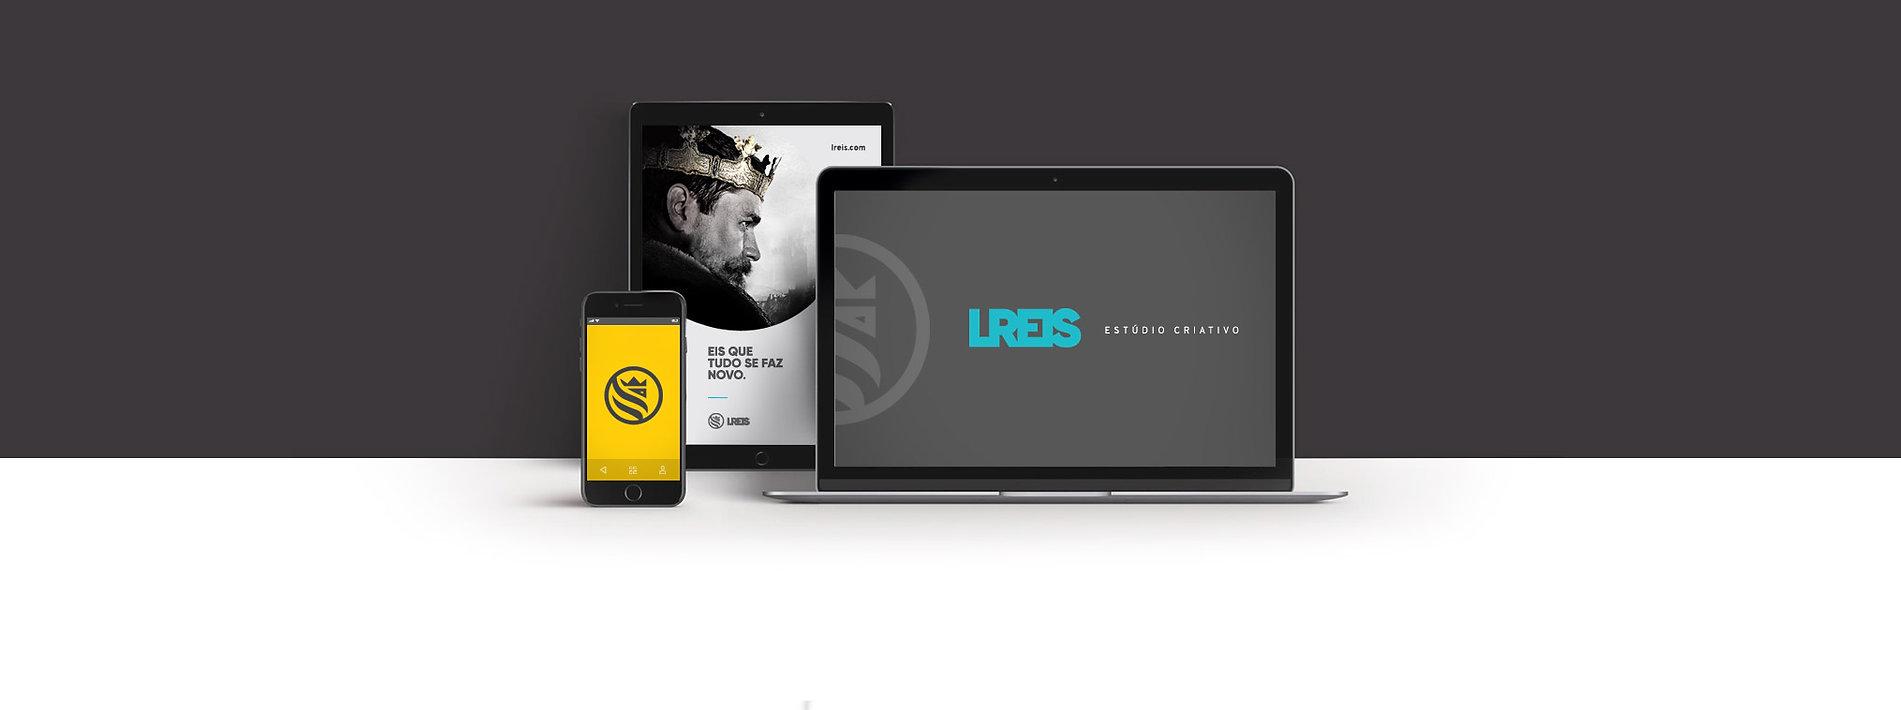 LReis rebrand